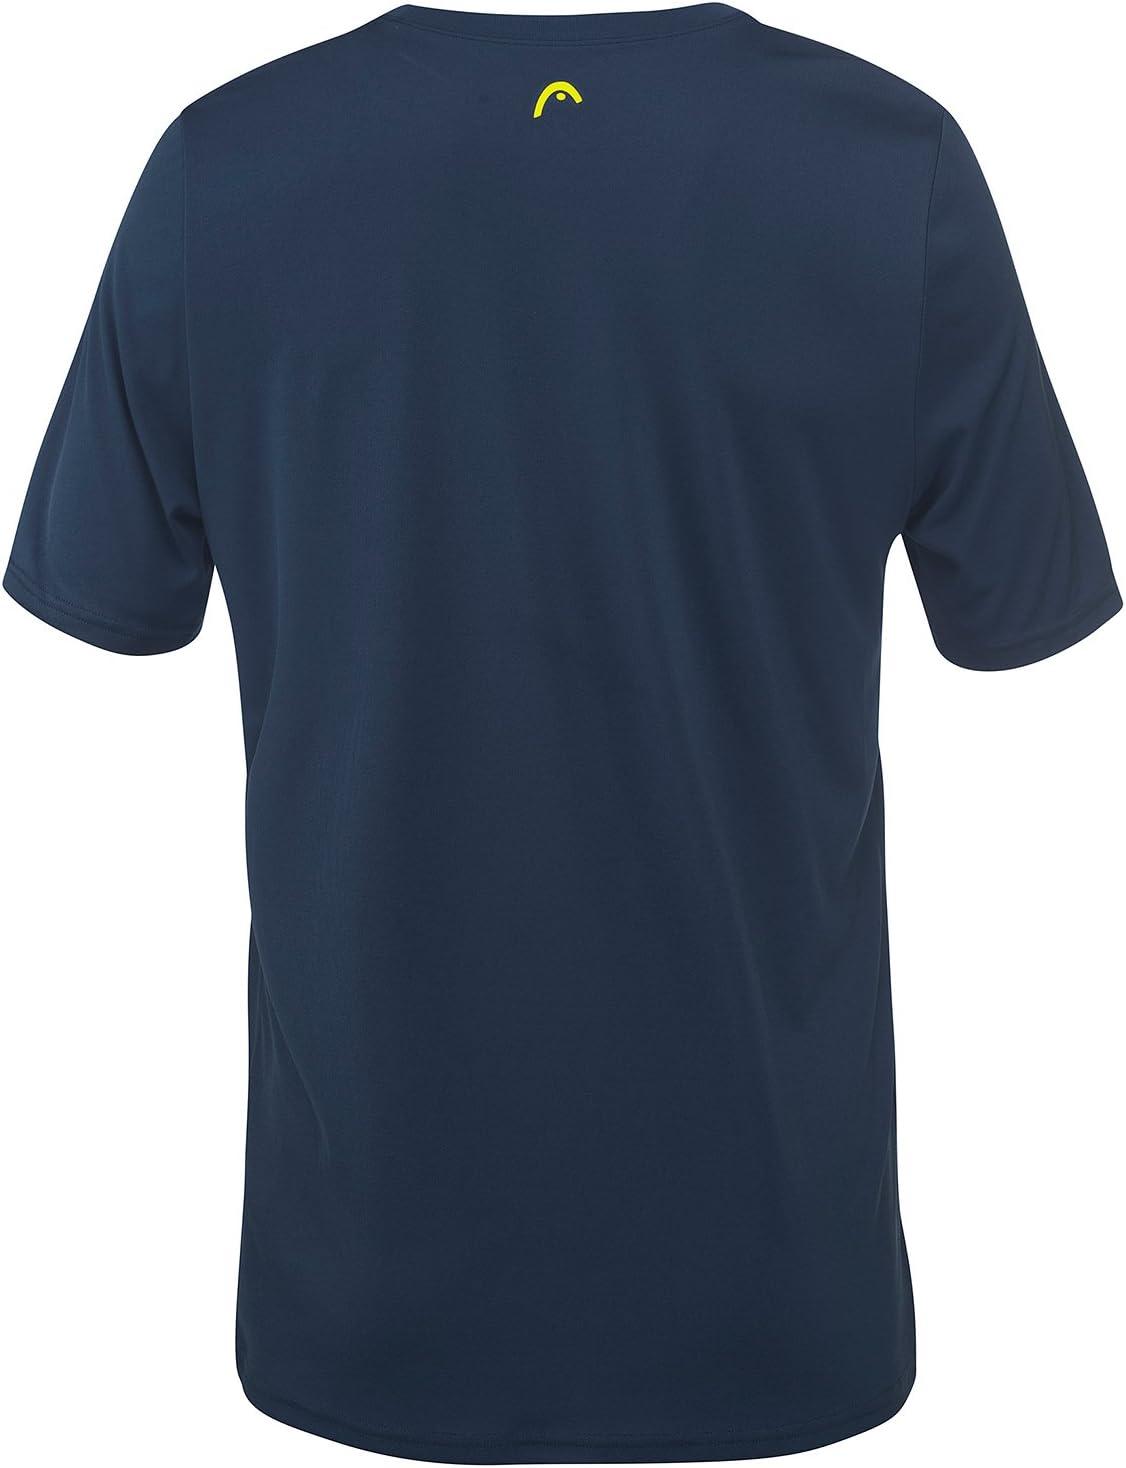 HEAD Basic Tech T-Shirt Enfant